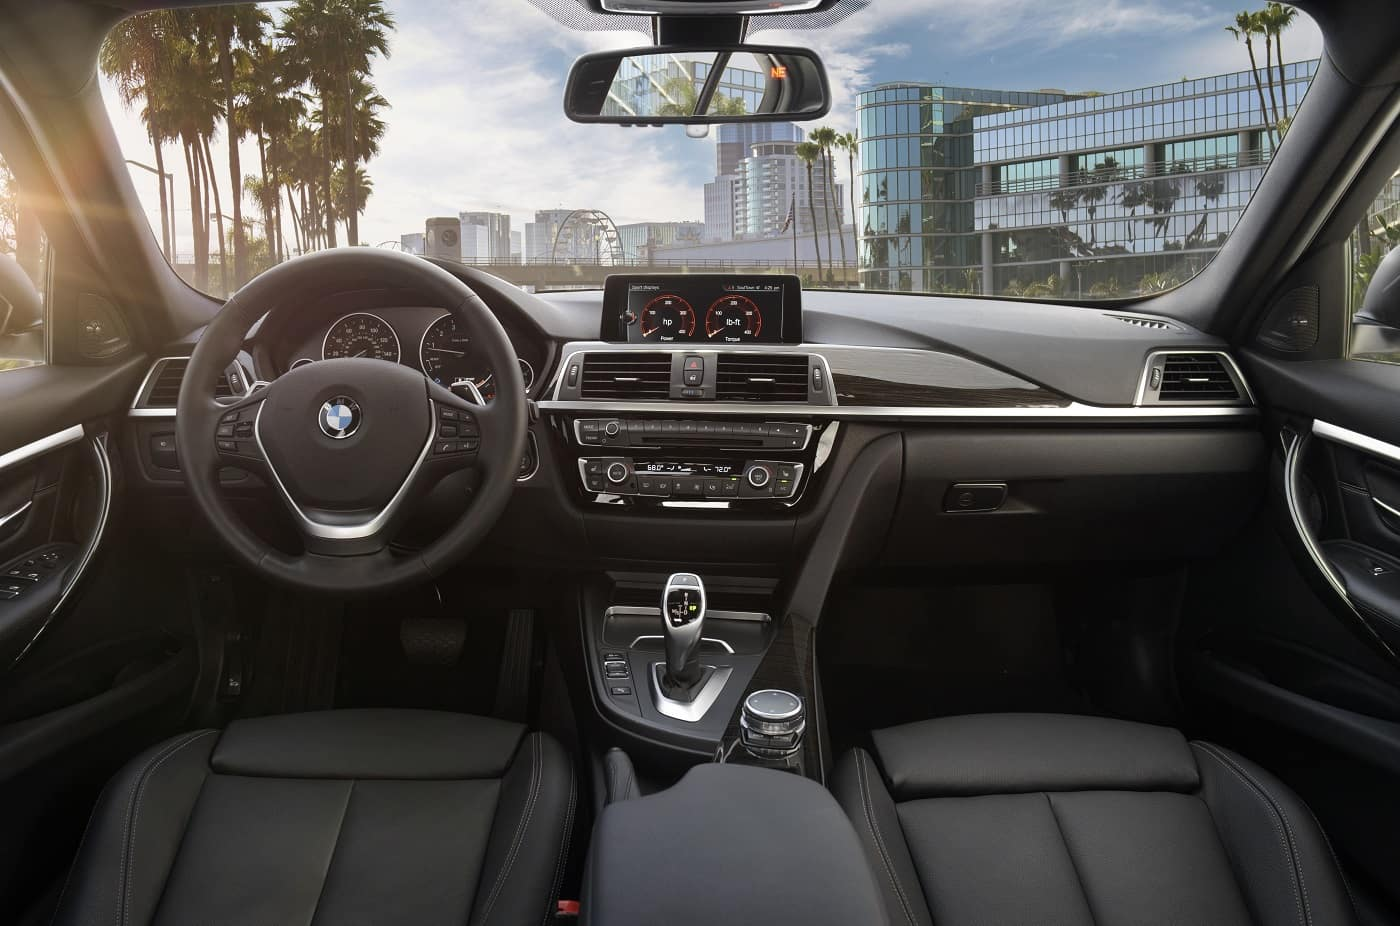 BMW 3 Series Interior Technology